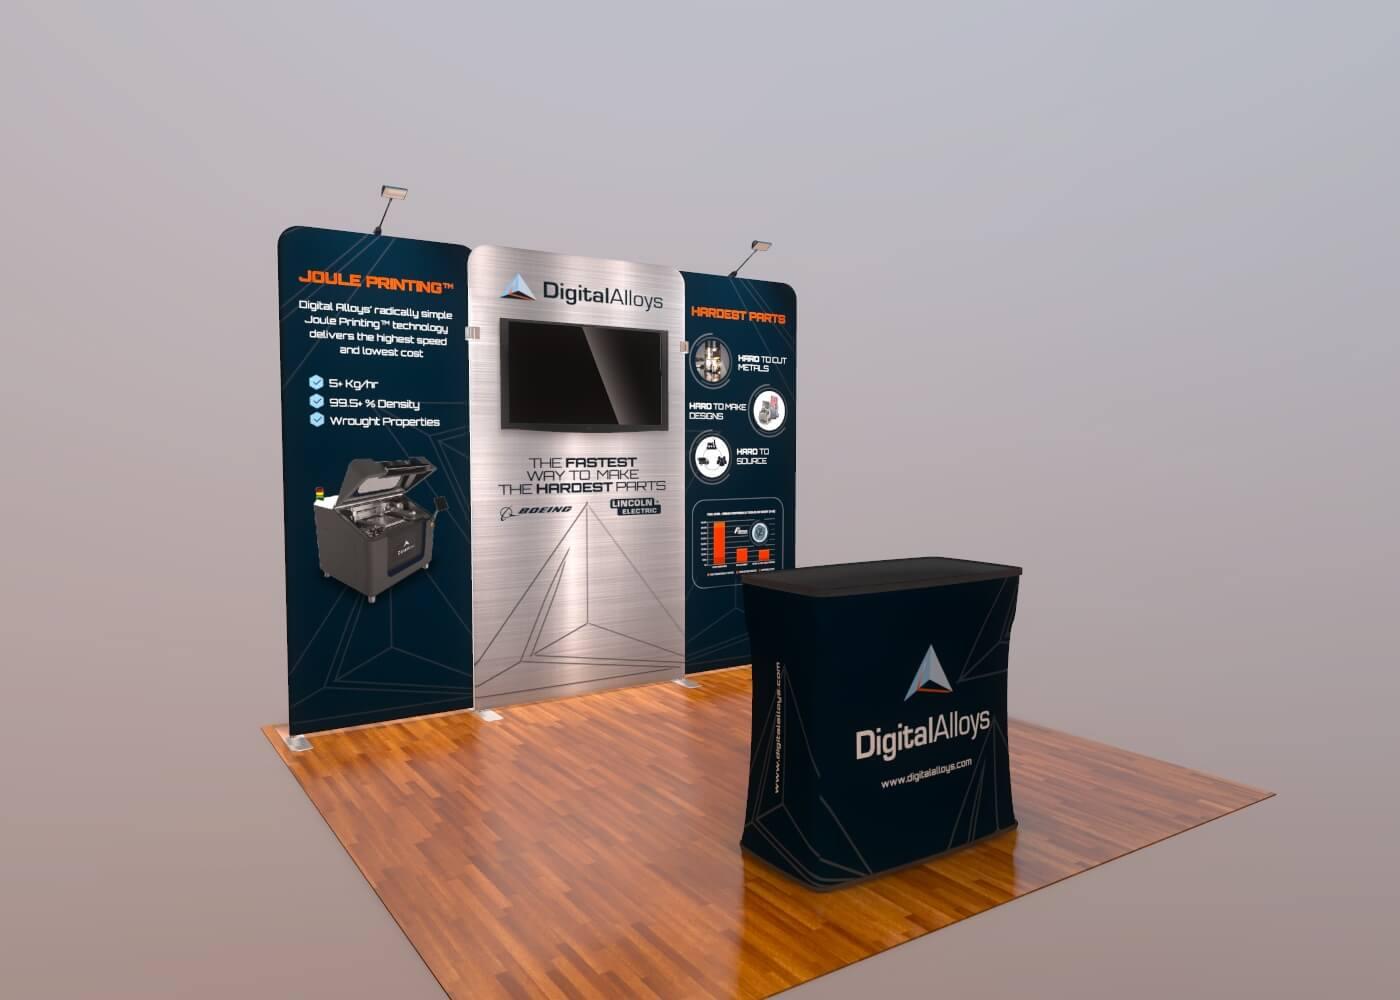 Digital Alloys